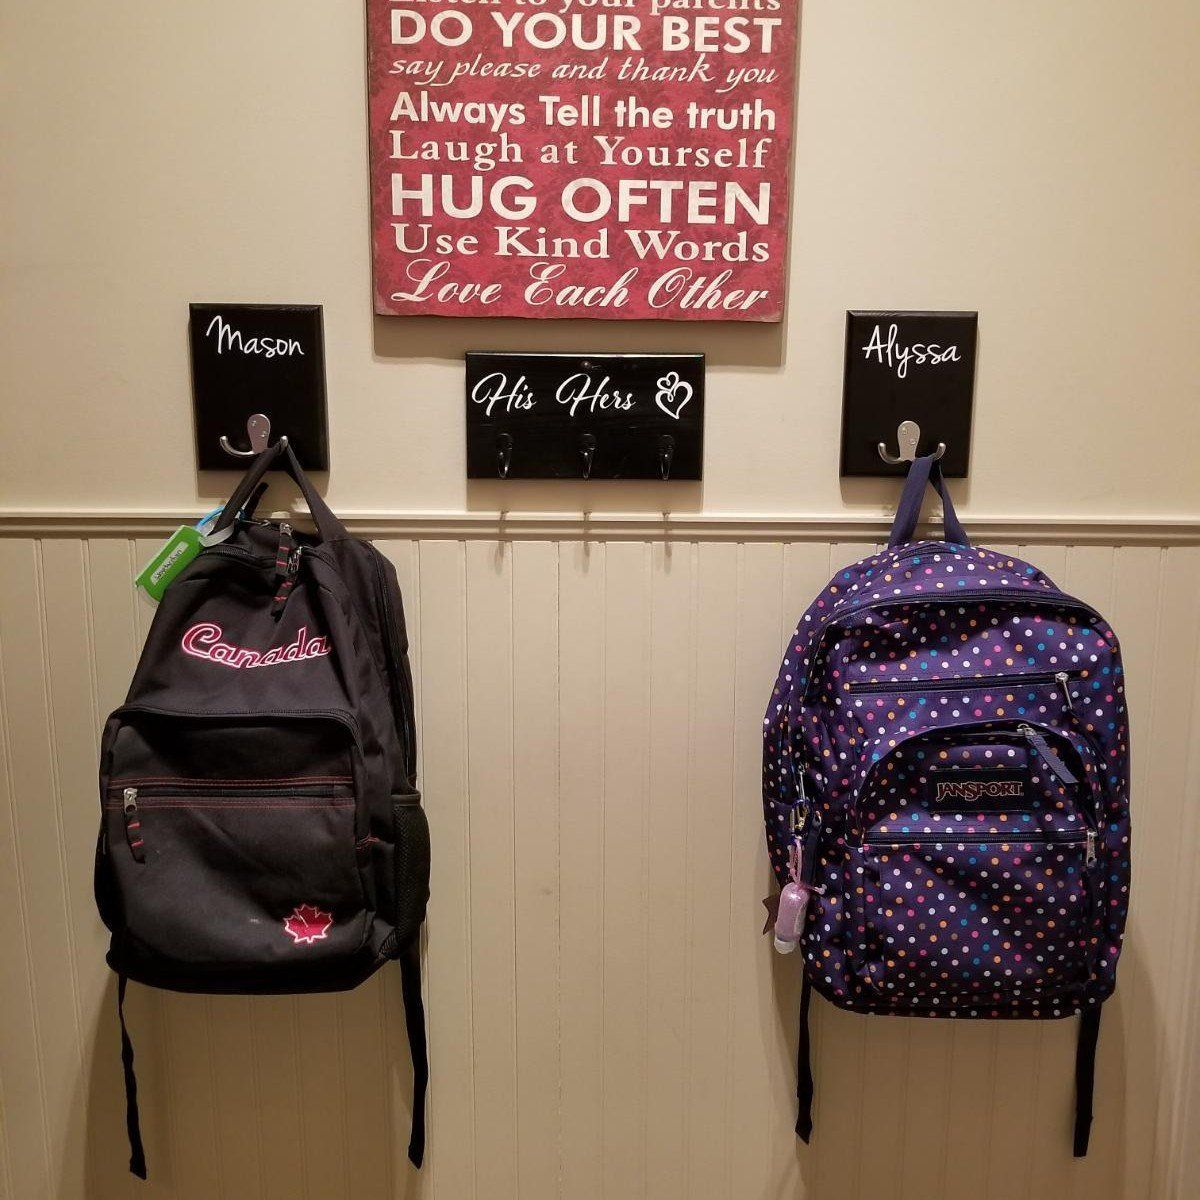 UrbanAlloy shared a new photo on Etsy Custom plaques